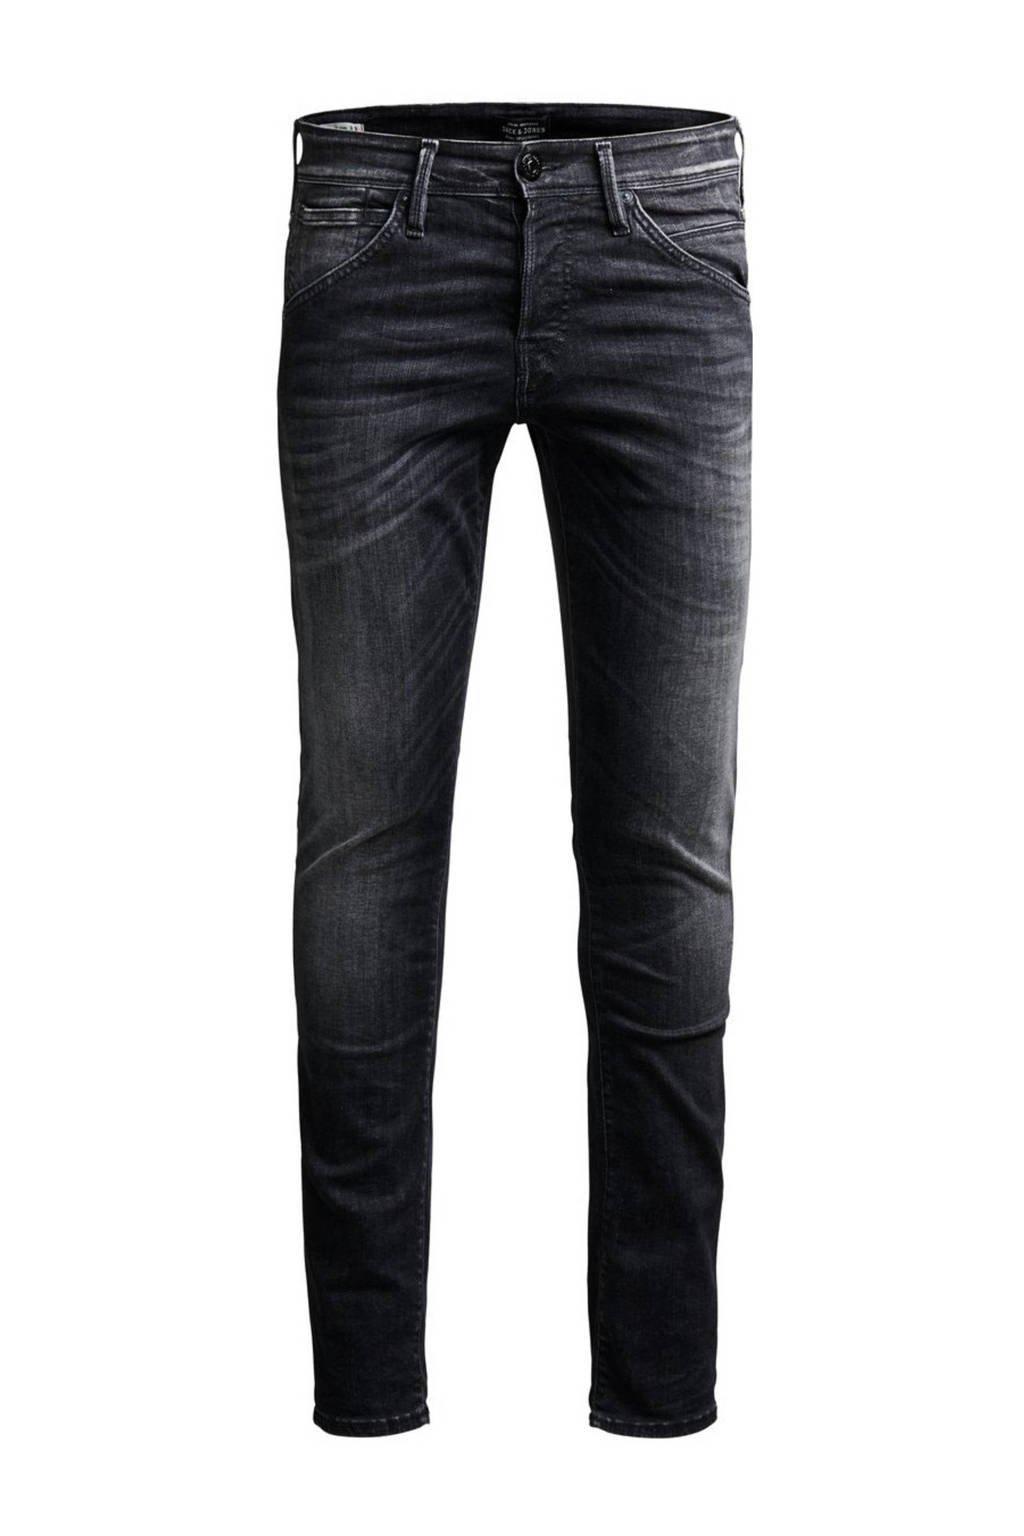 JACK & JONES JEANS INTELLIGENCE slim fit jeans Glenn Grey denim, 655 Grey Denim